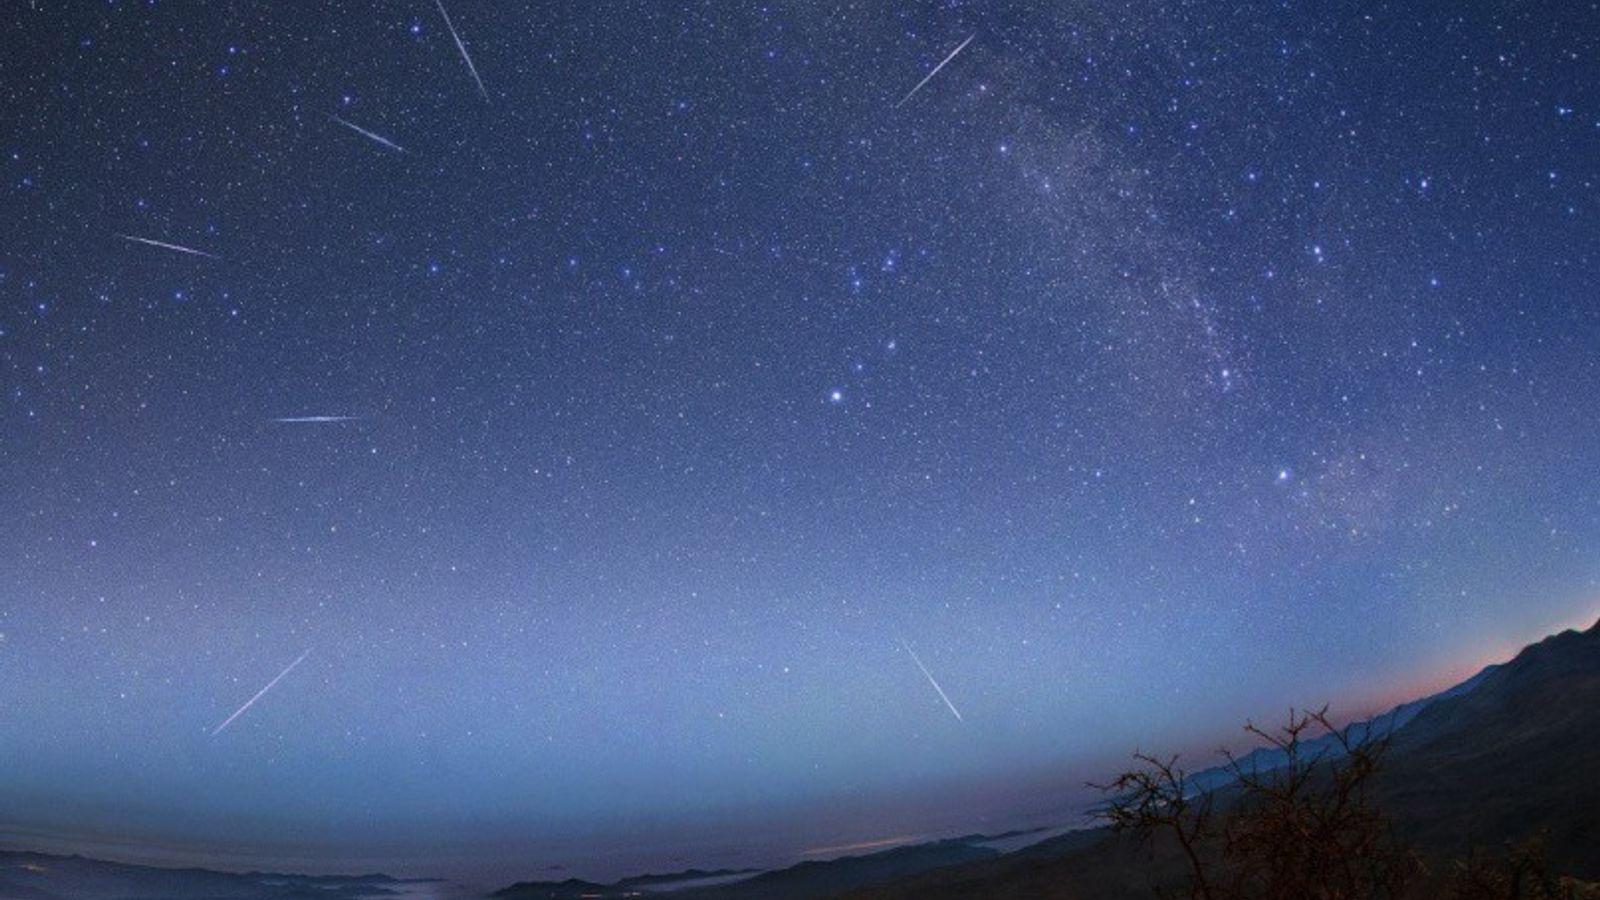 Eta Aquarid meteors race across the sky over the Atacama Desert in Chile during the 2015 ...